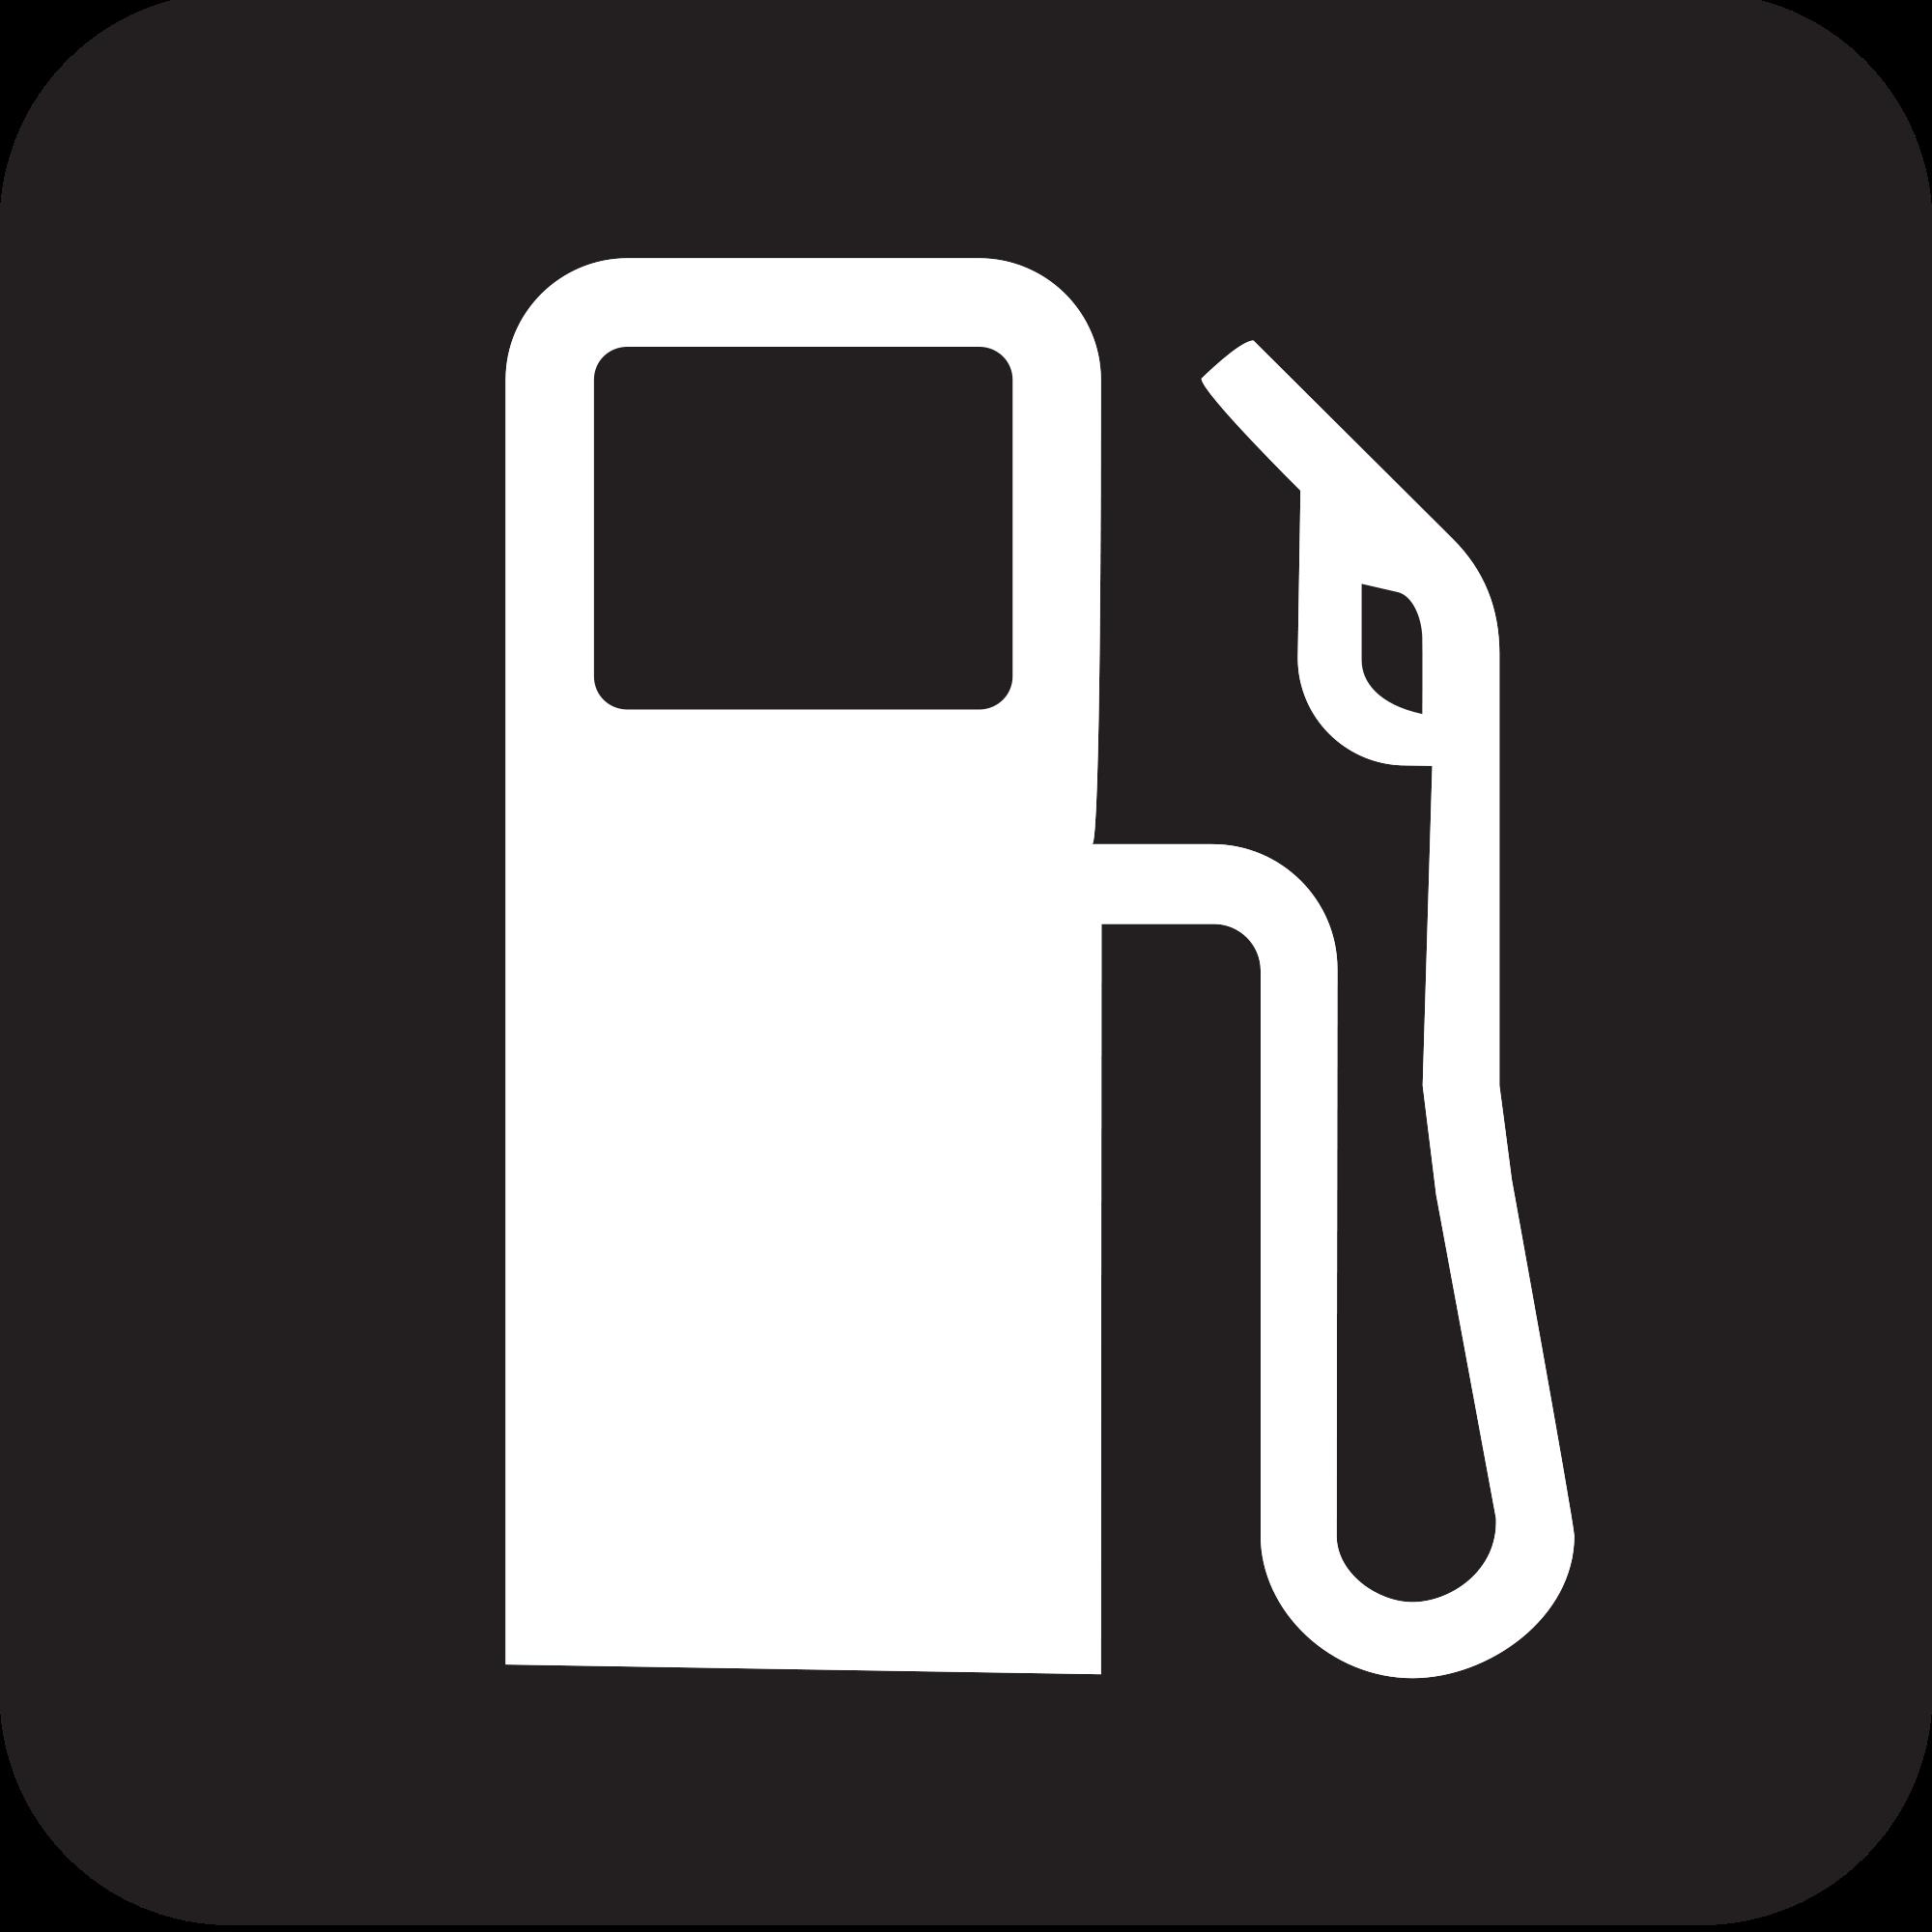 La buena, baja la gasolina; la mala, sólo 2 centavos por litro.